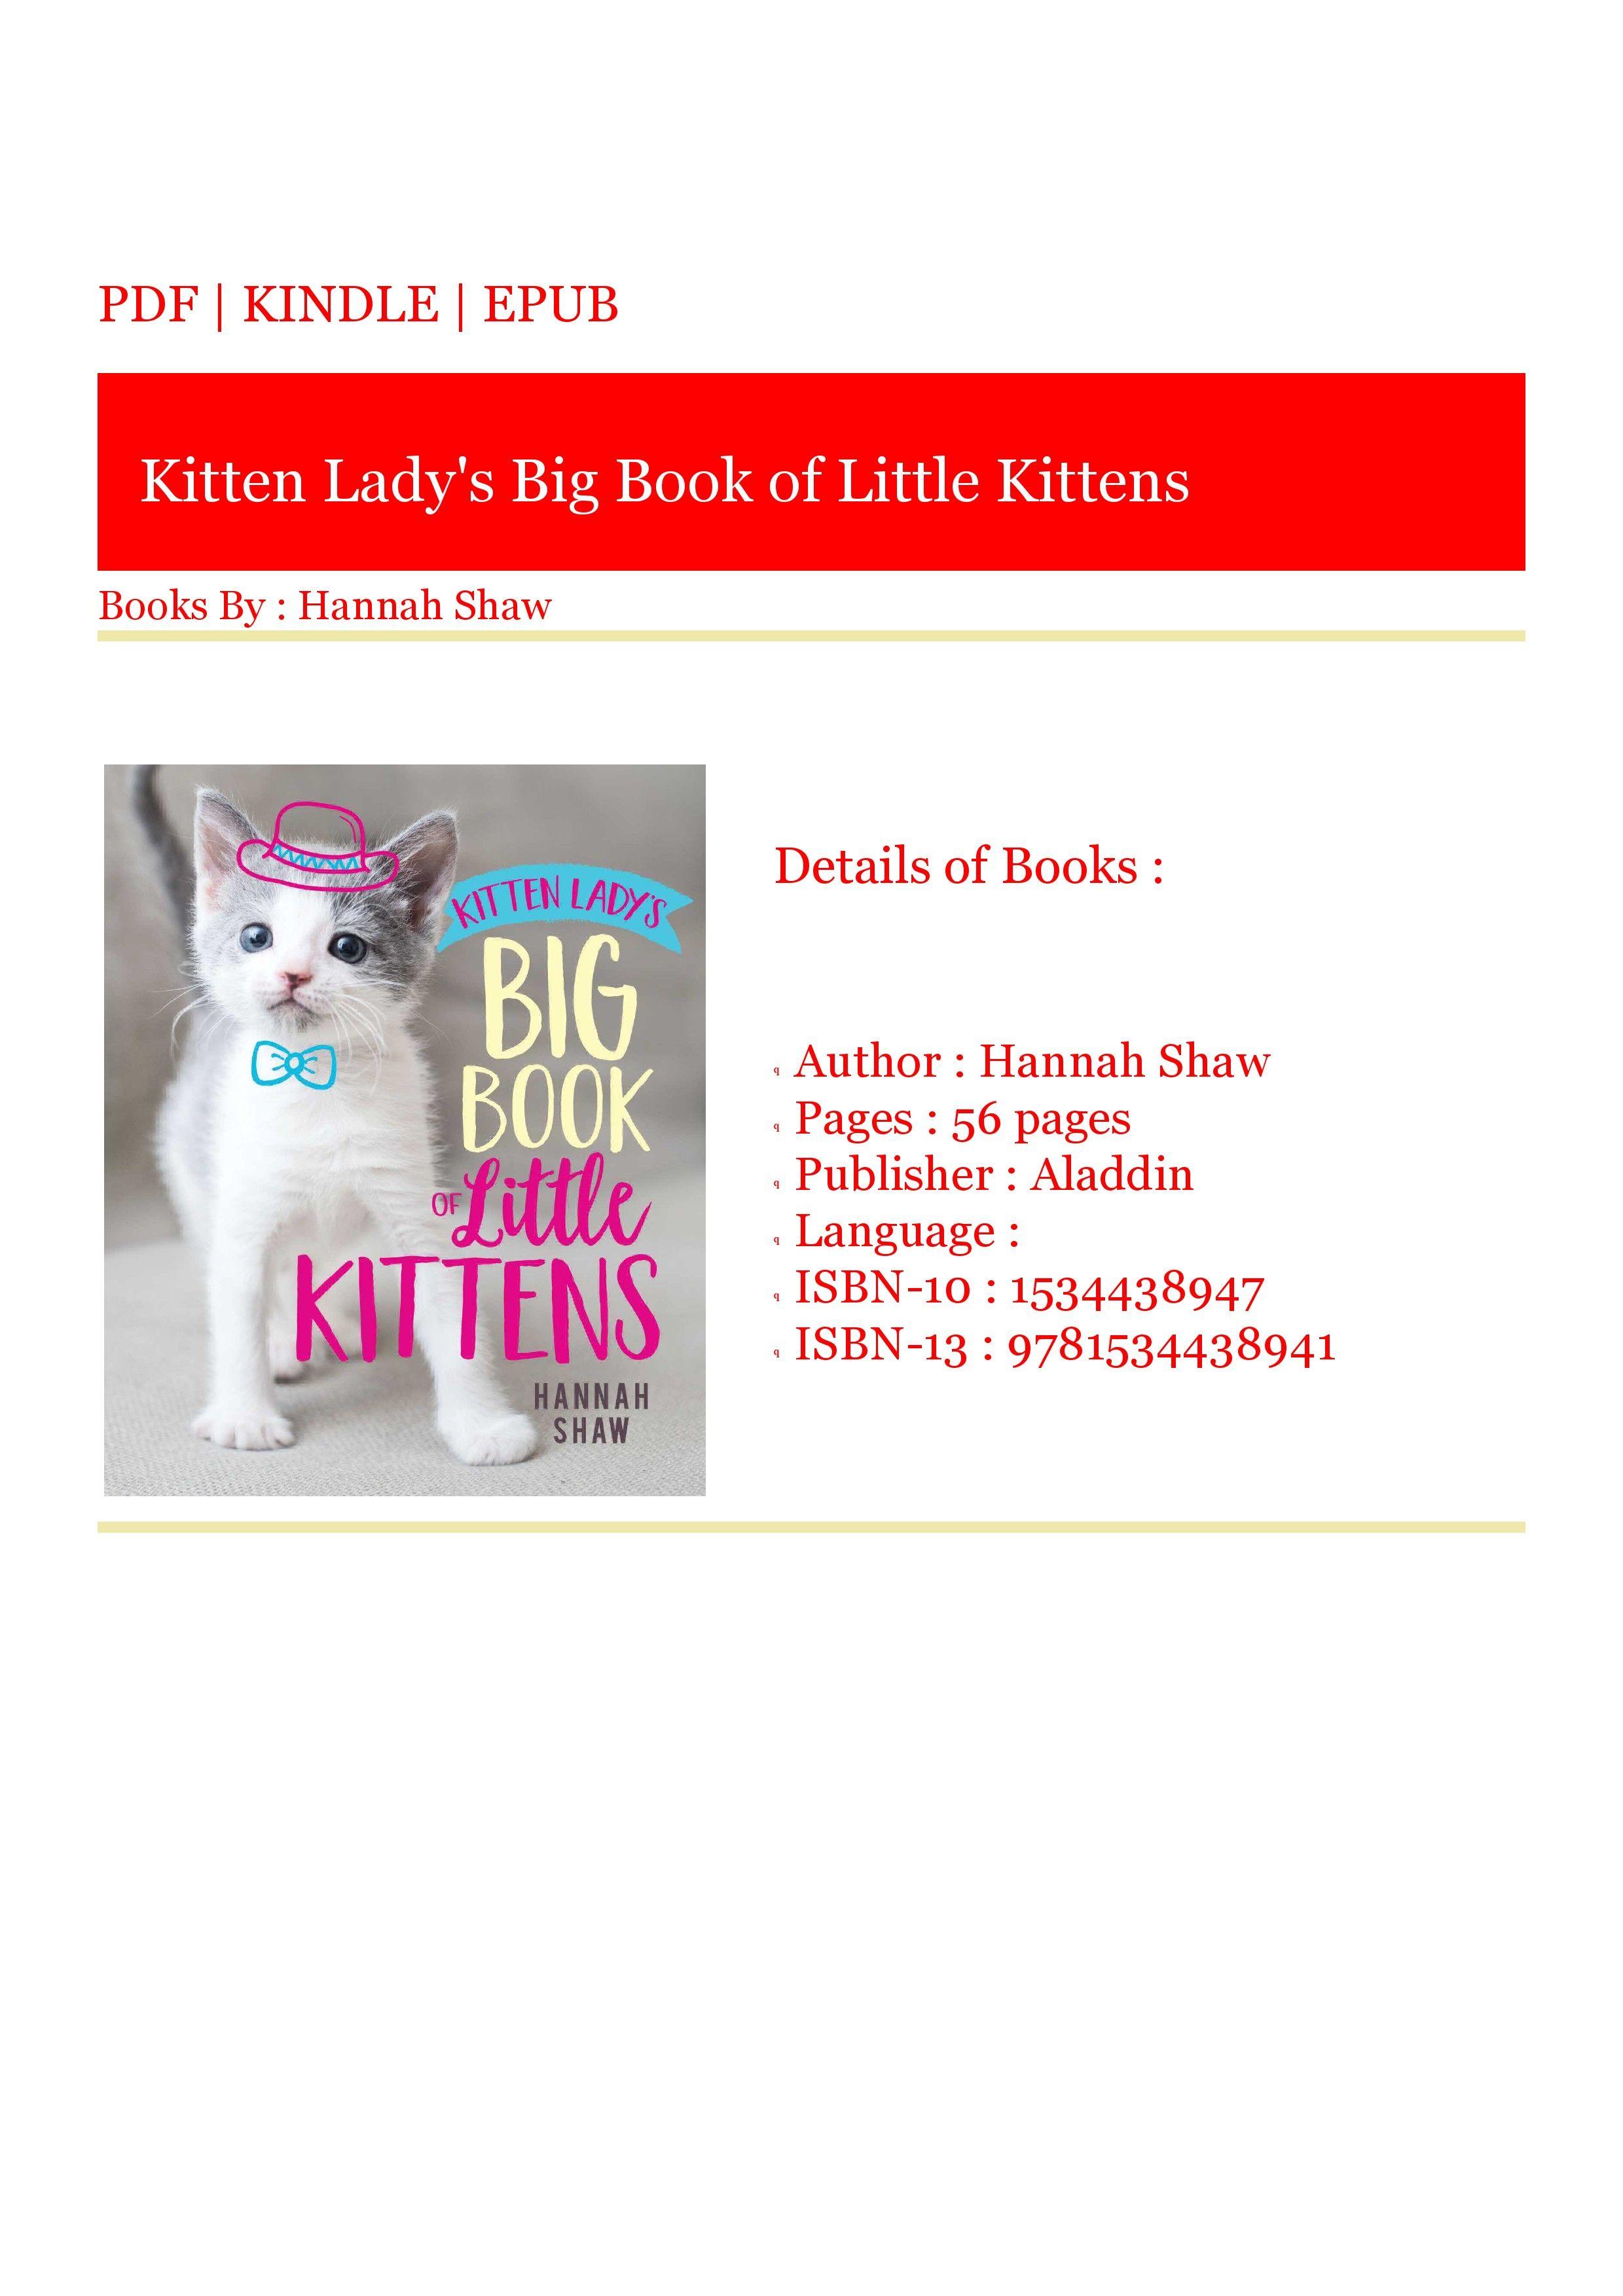 Download Read Kitten Lady S Big Book Of Little Kittens In 2020 Big Book Little Kittens Kitten